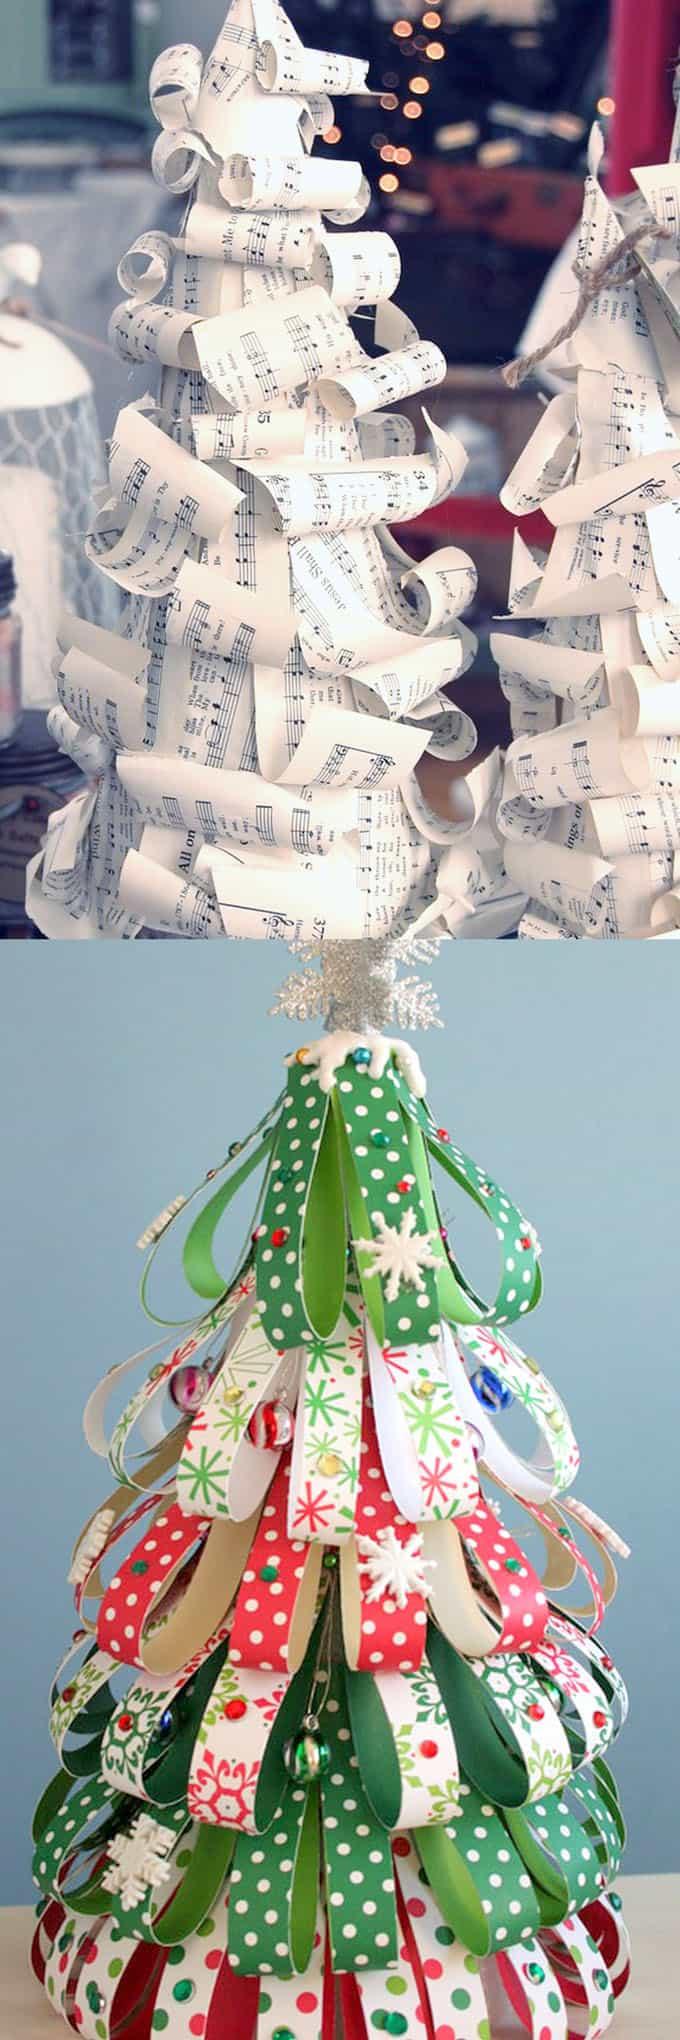 Book Christmas Tree Craft